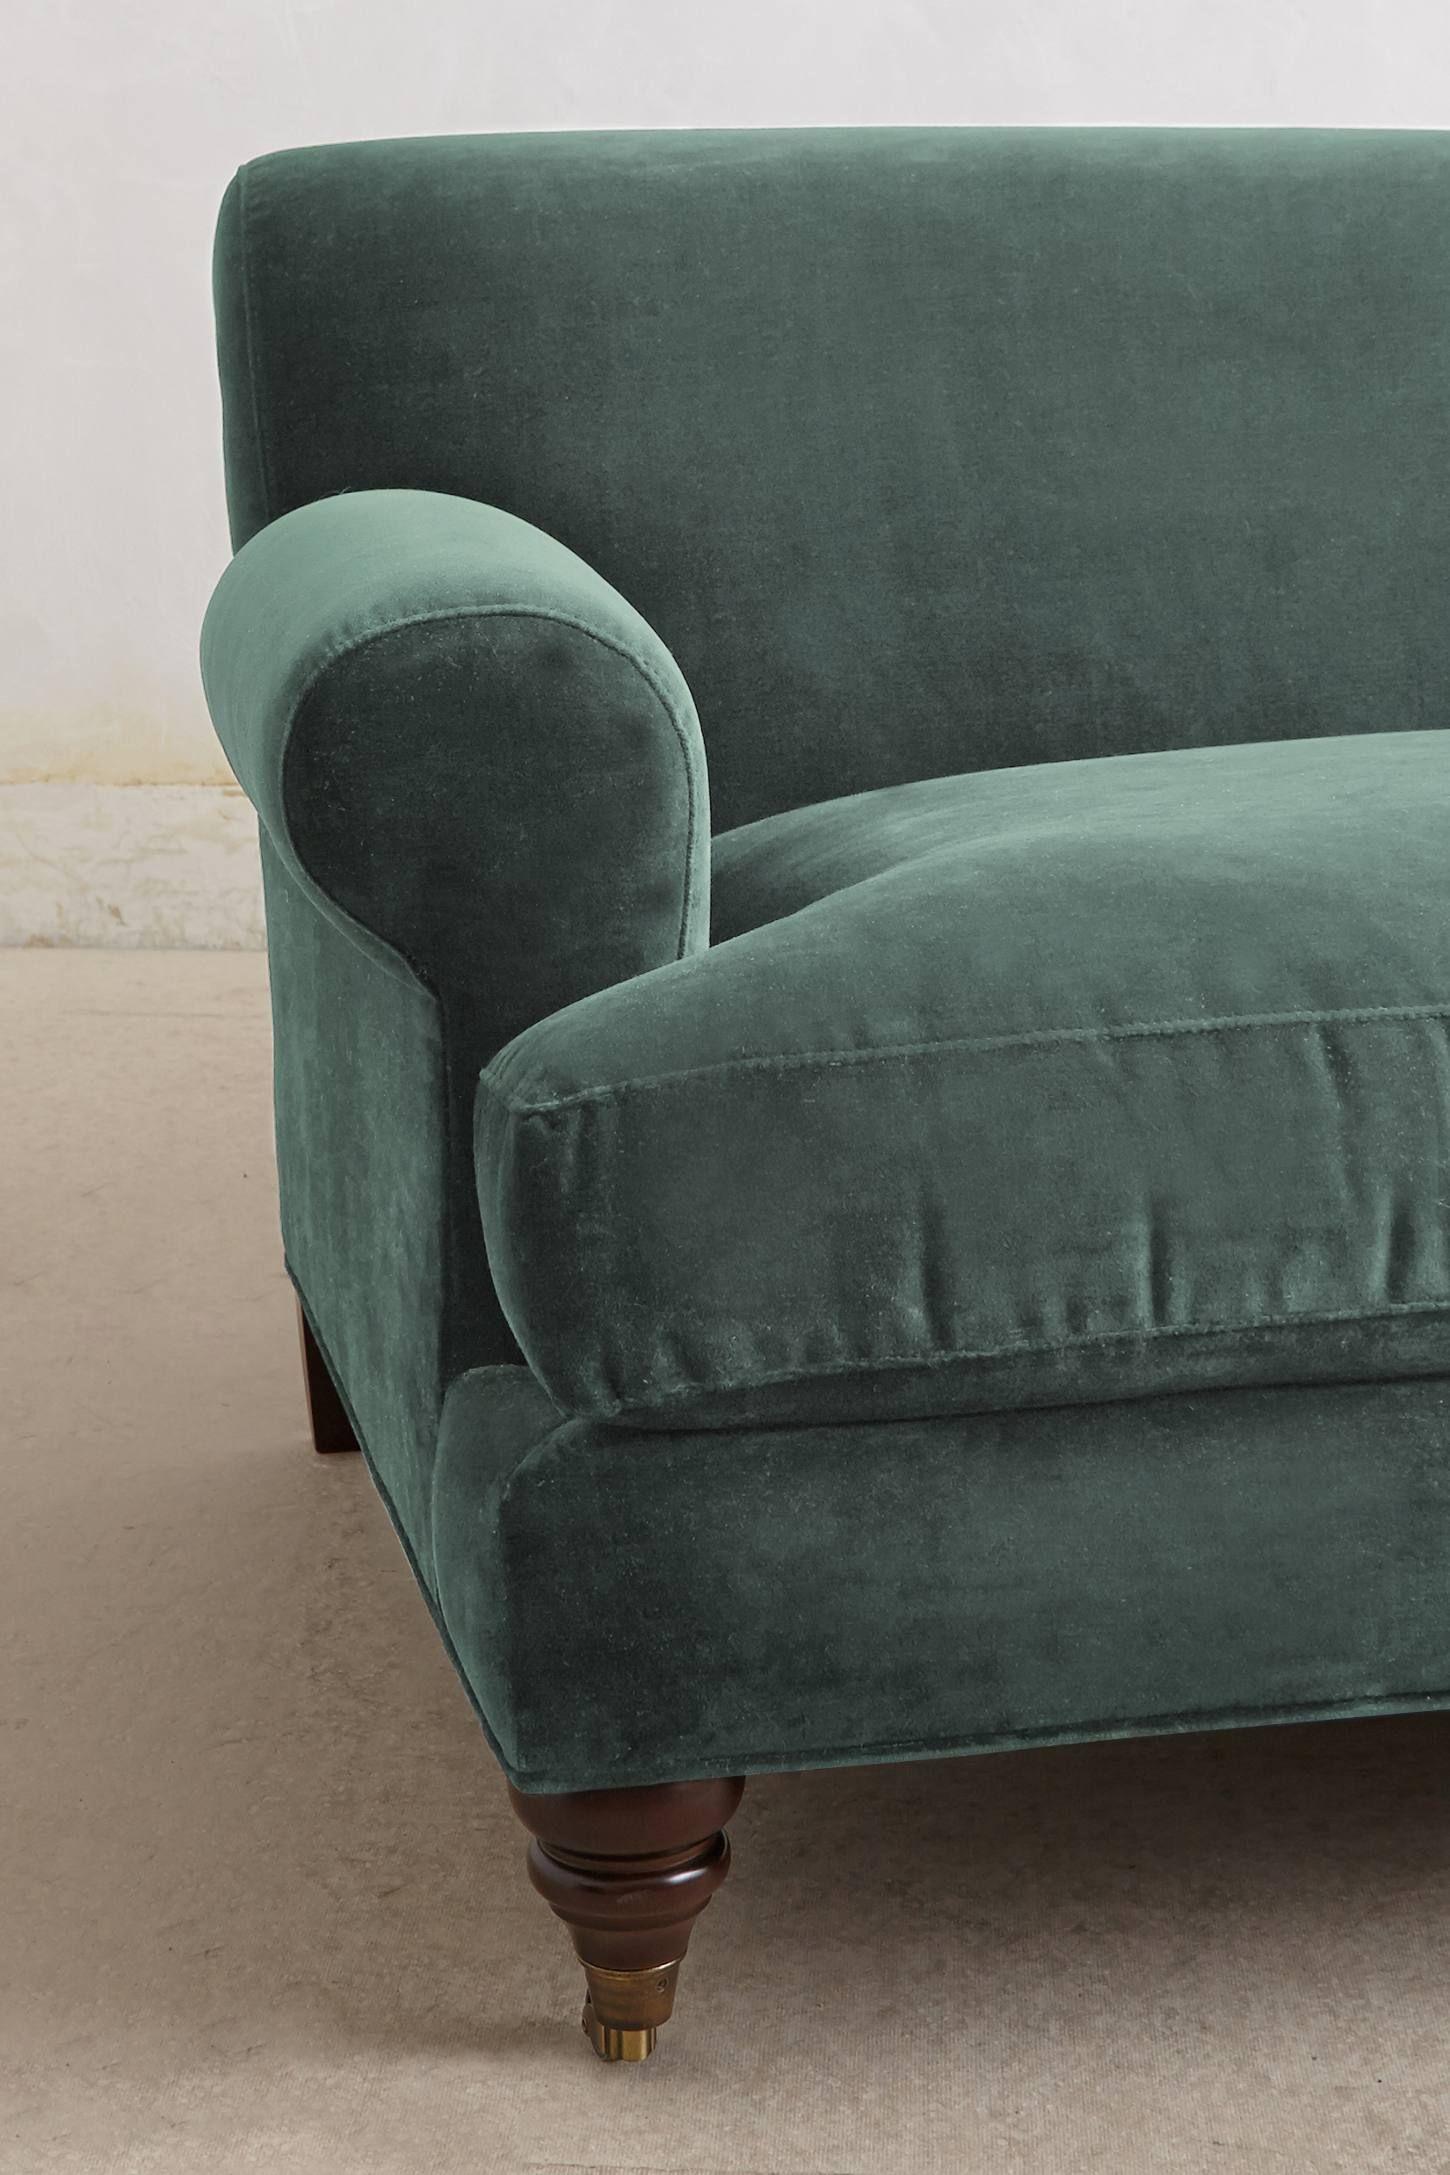 Velvet Willoughby Sofa, Hickory Sofa colors, Furniture, Sofa